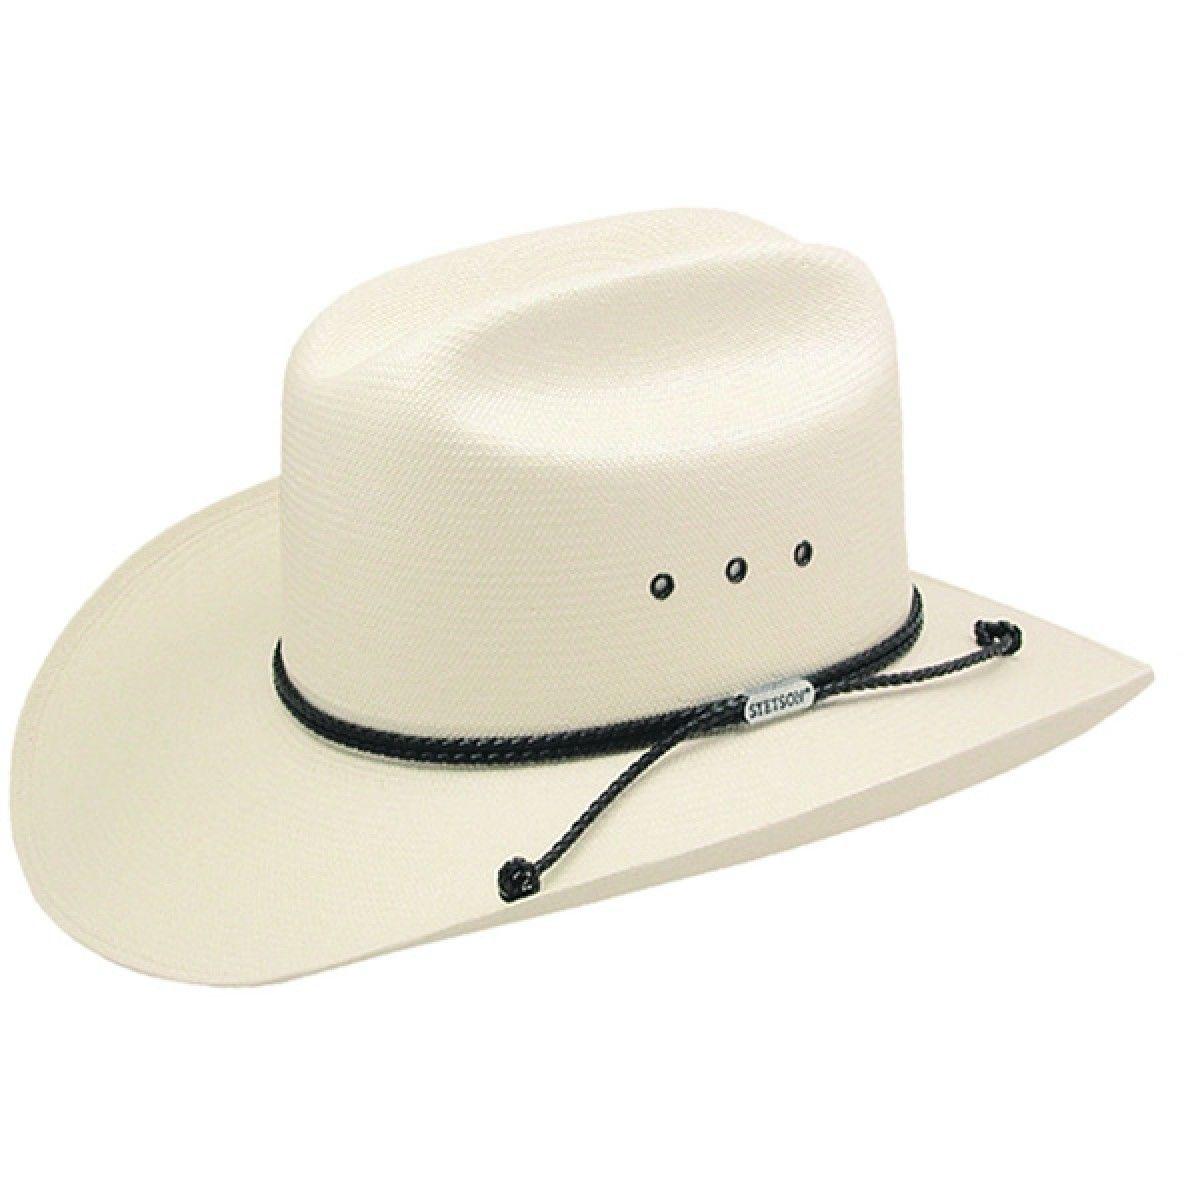 Stetson Carson - (10X) Straw Cowboy Hat  bc8c1ce7fc97